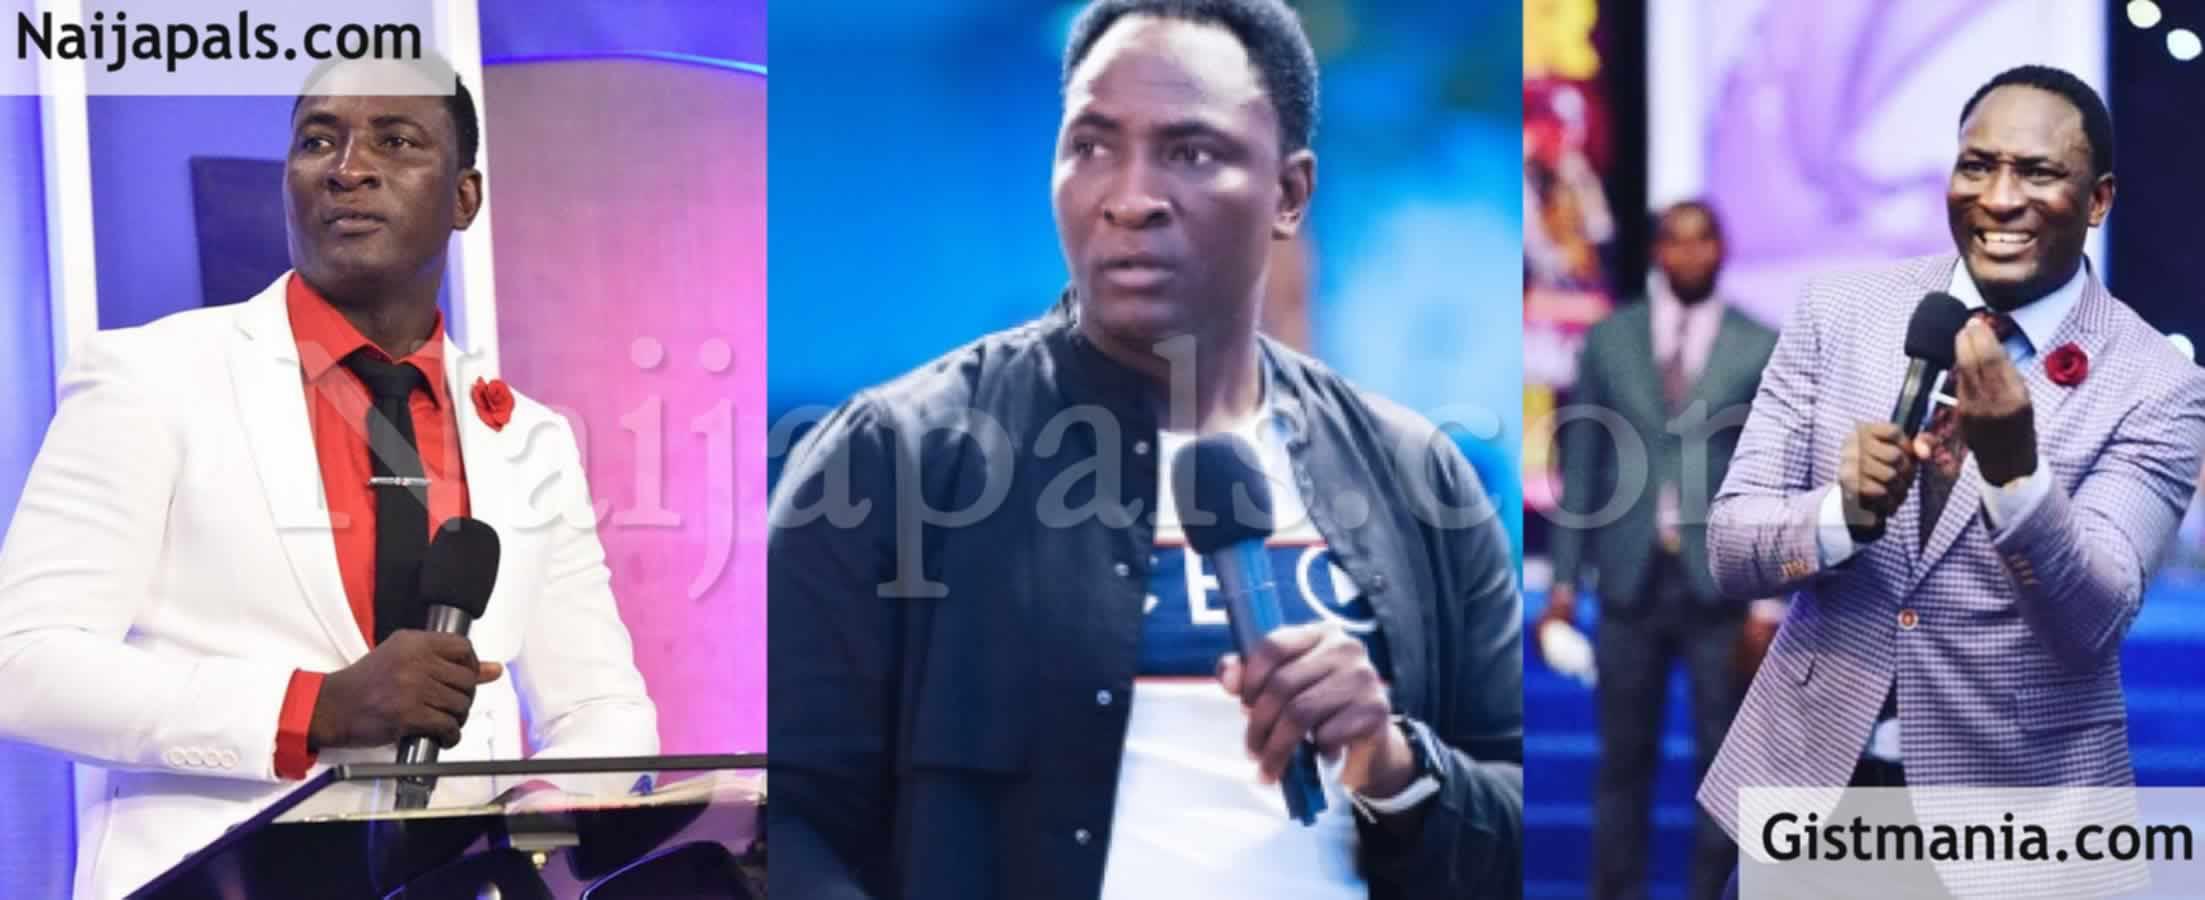 <img alt='.' class='lazyload' data-src='https://img.gistmania.com/emot/comment.gif' /> <b>Prophet Jeremiah Challenges Billionaire Pastors, Urges Them To Help Nigerians In Difficult Time</b>